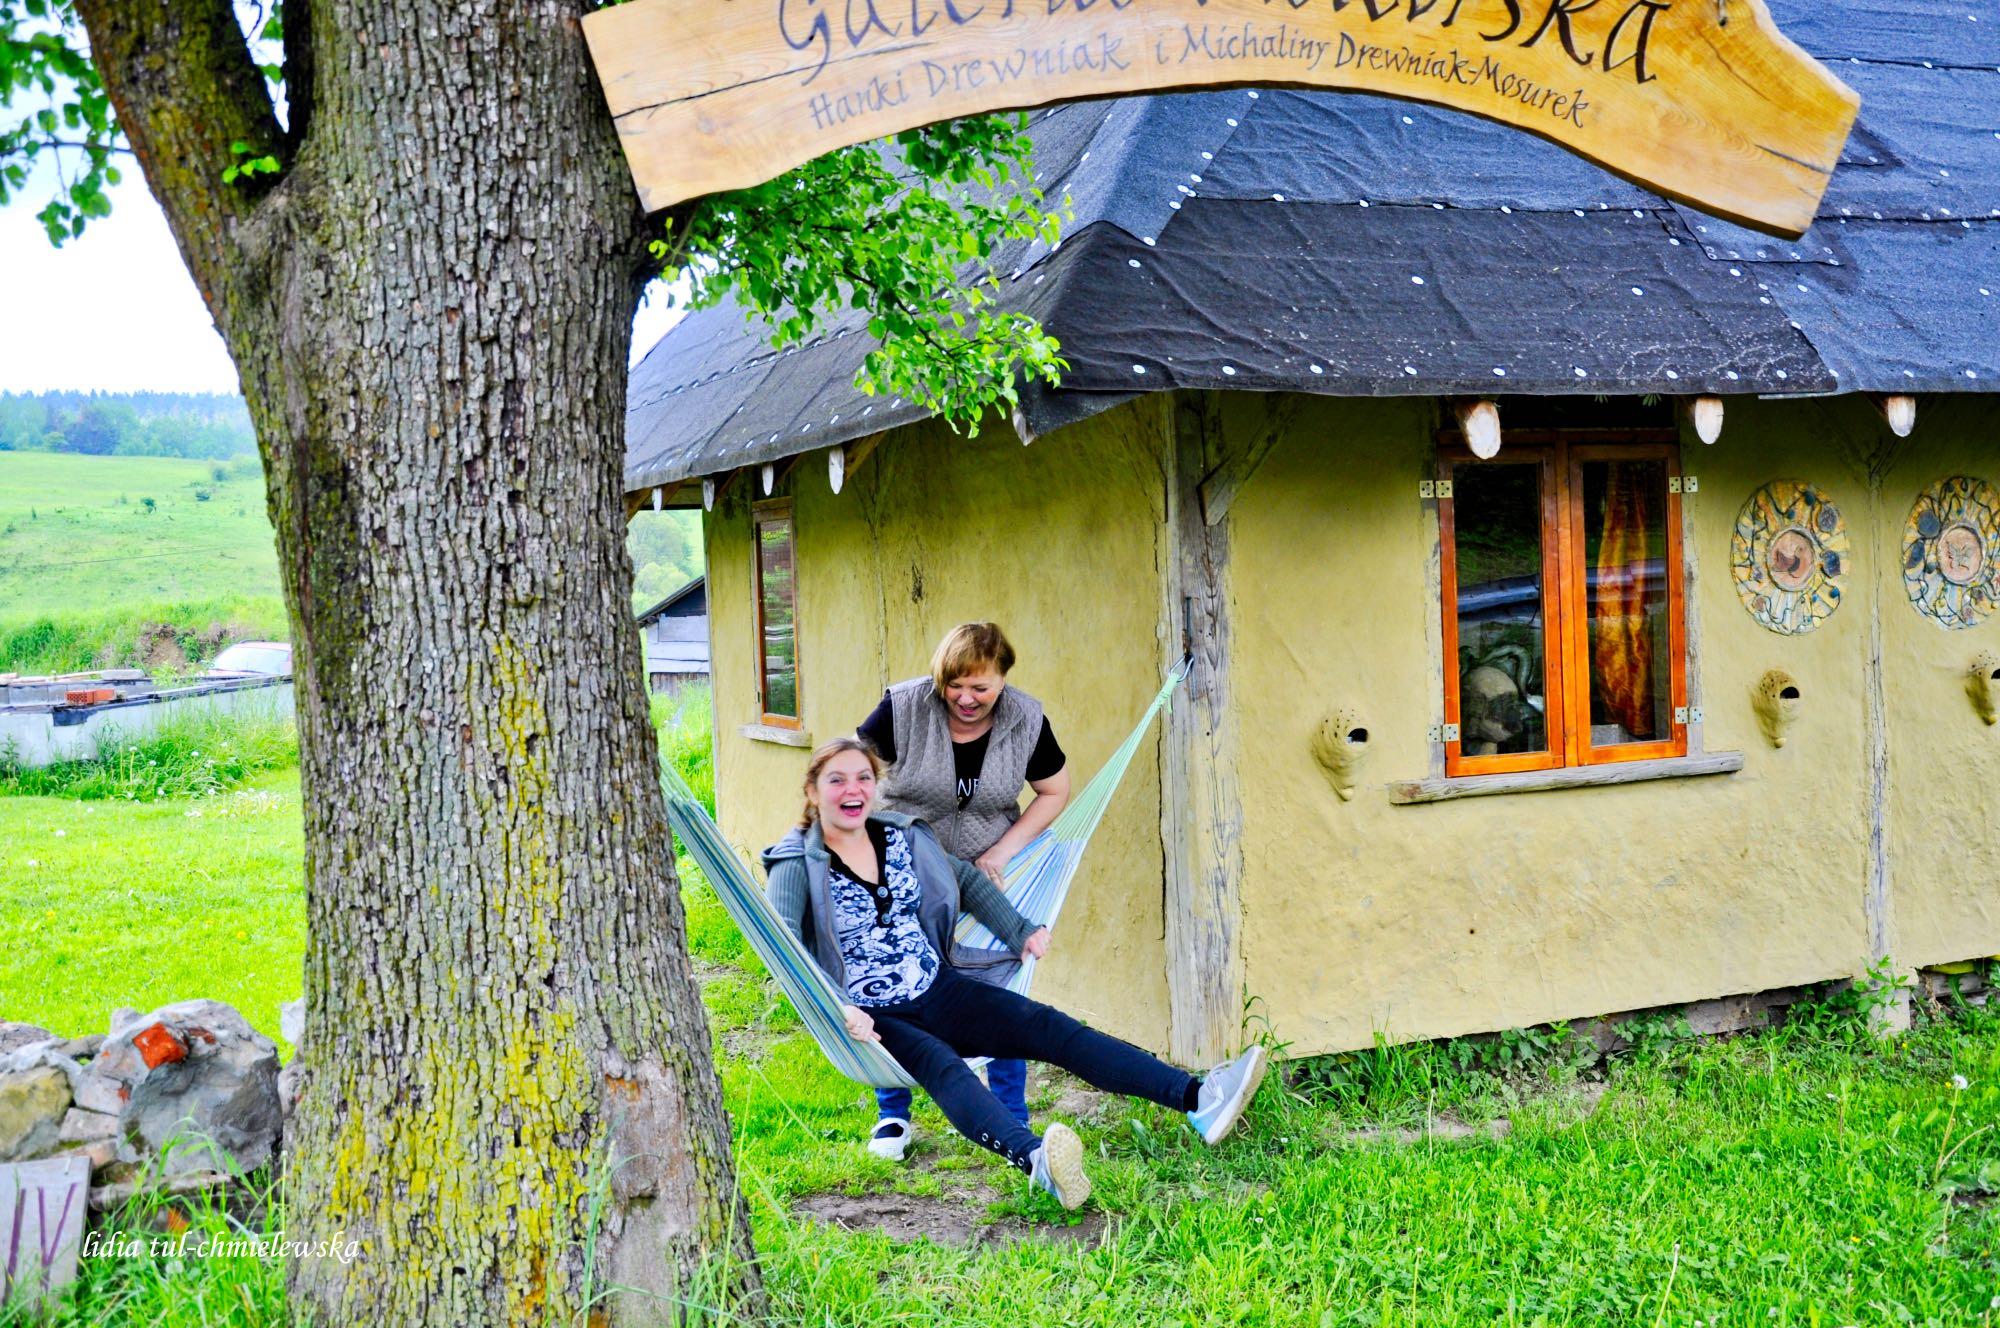 Hanka Hamerska-Drewniak i Michalina Drewniak-Mosurek / fot. Lidia Tul-Chmielewska